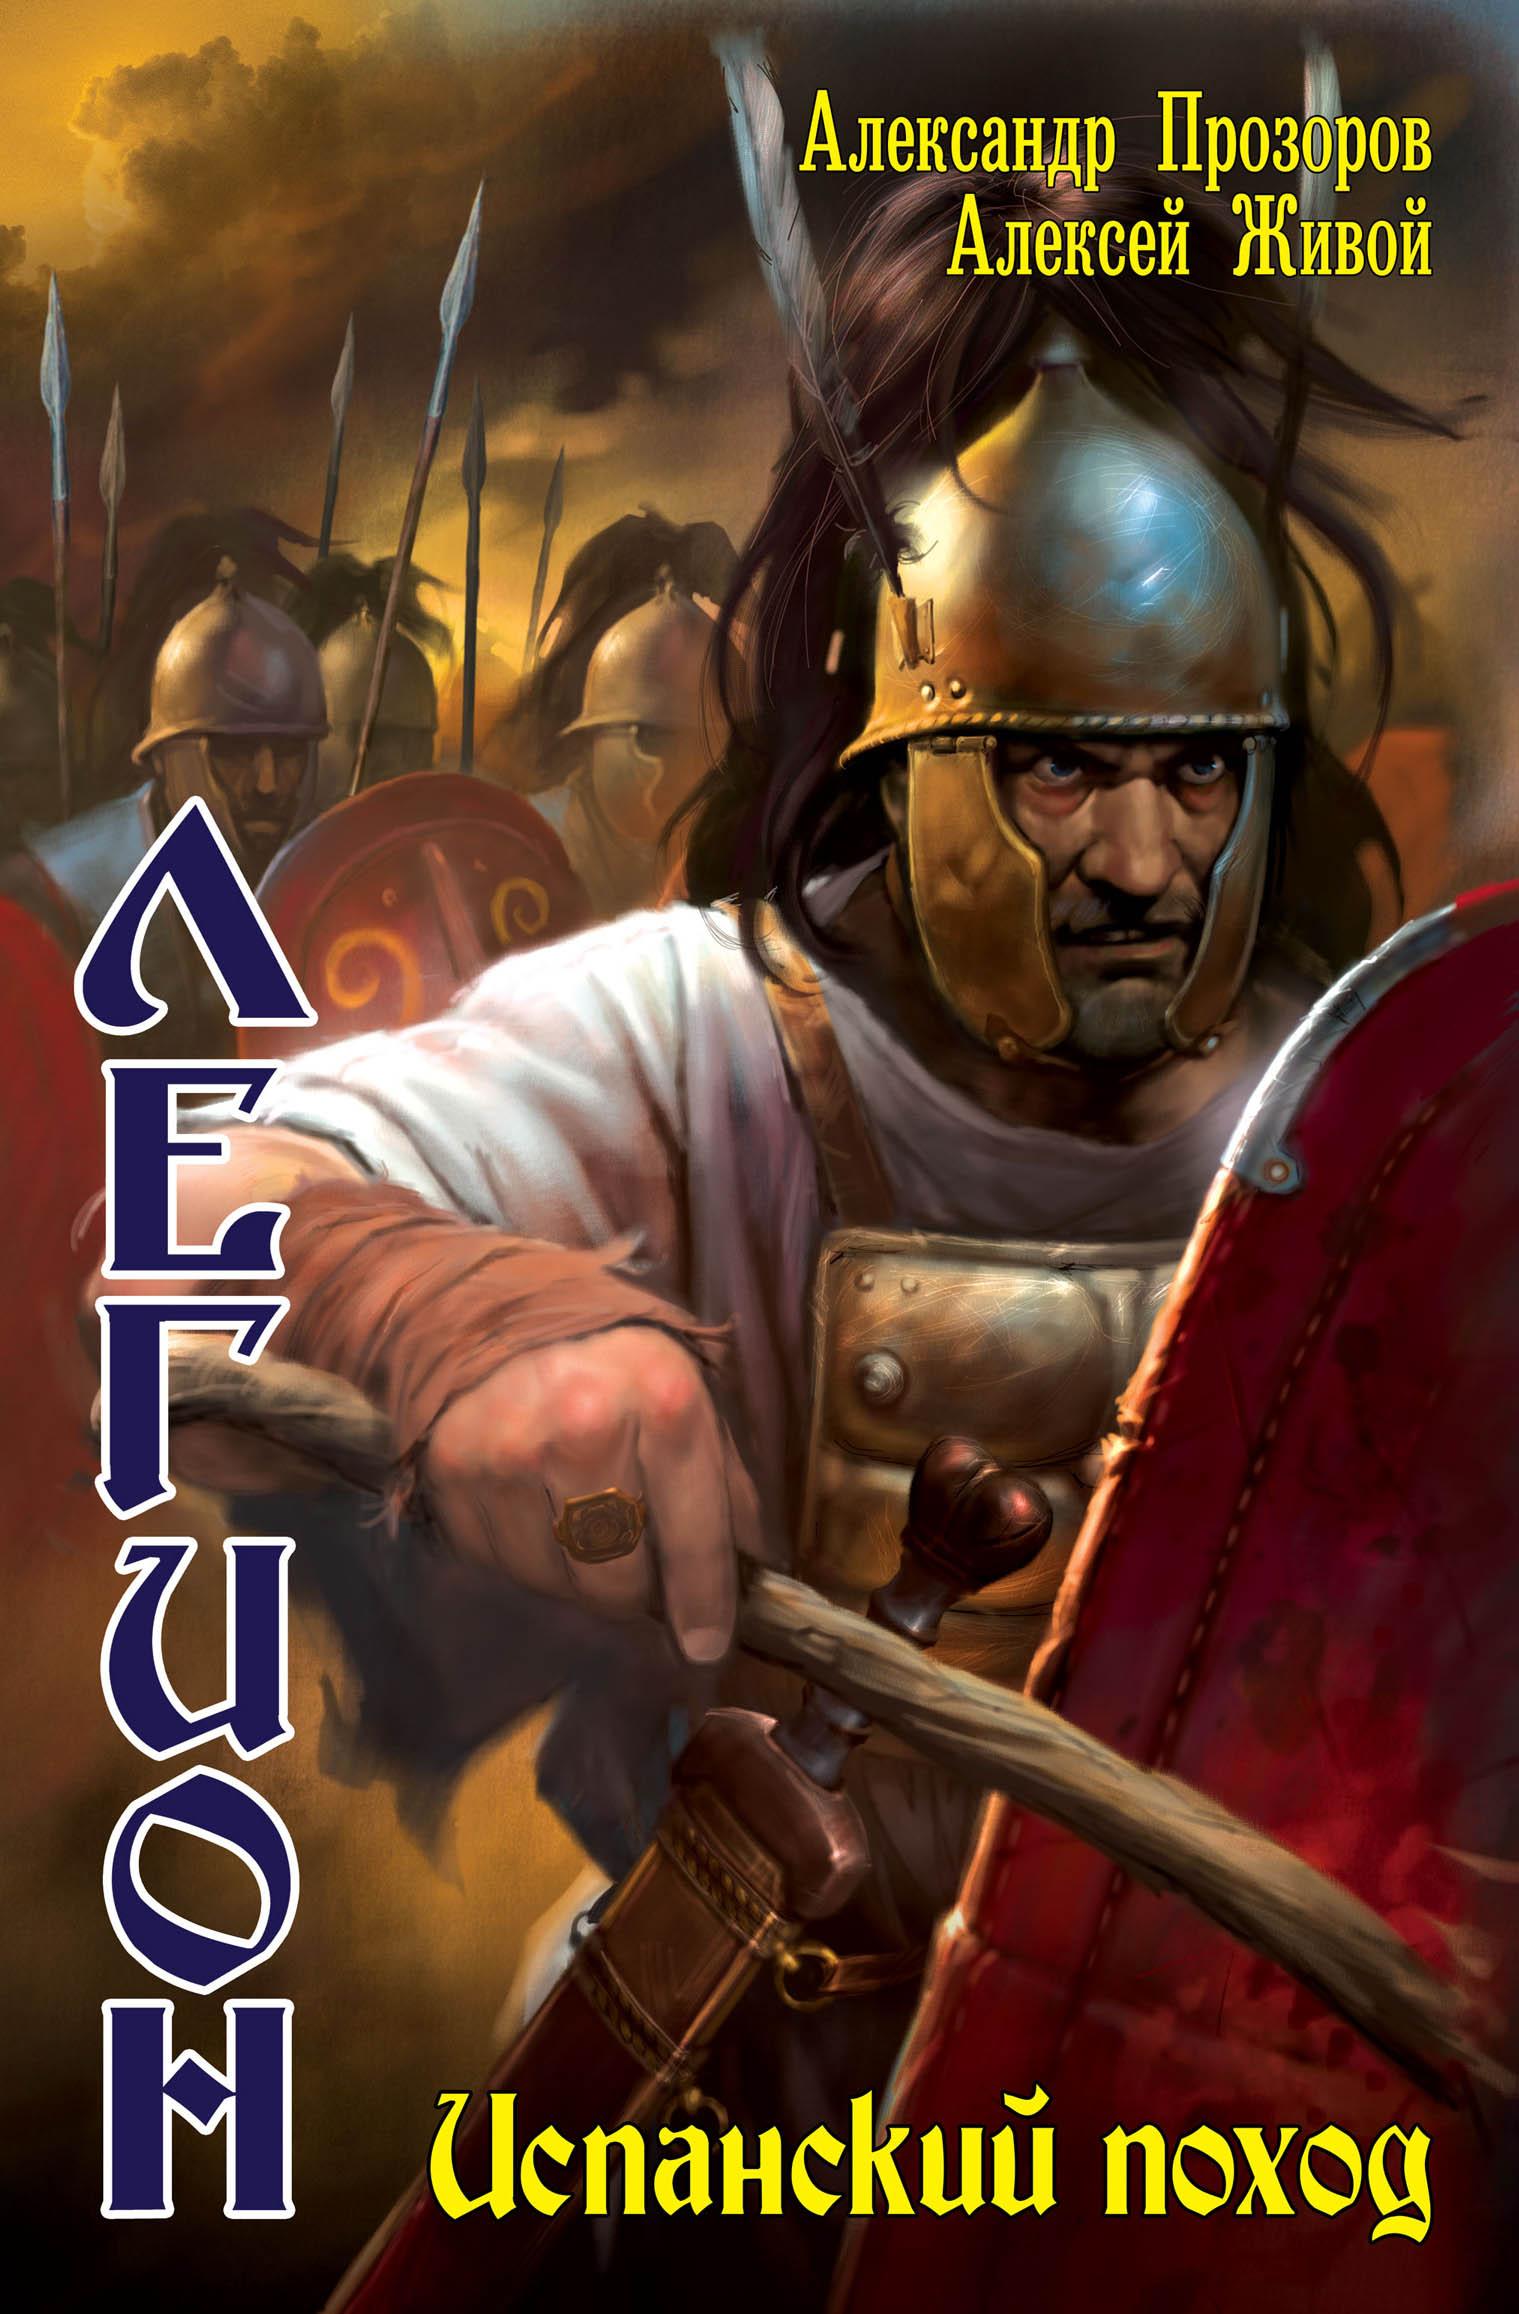 Александр Прозоров Испанский поход прозоров александр дмитриевич легион прыжок льва испанский поход смертельный удар